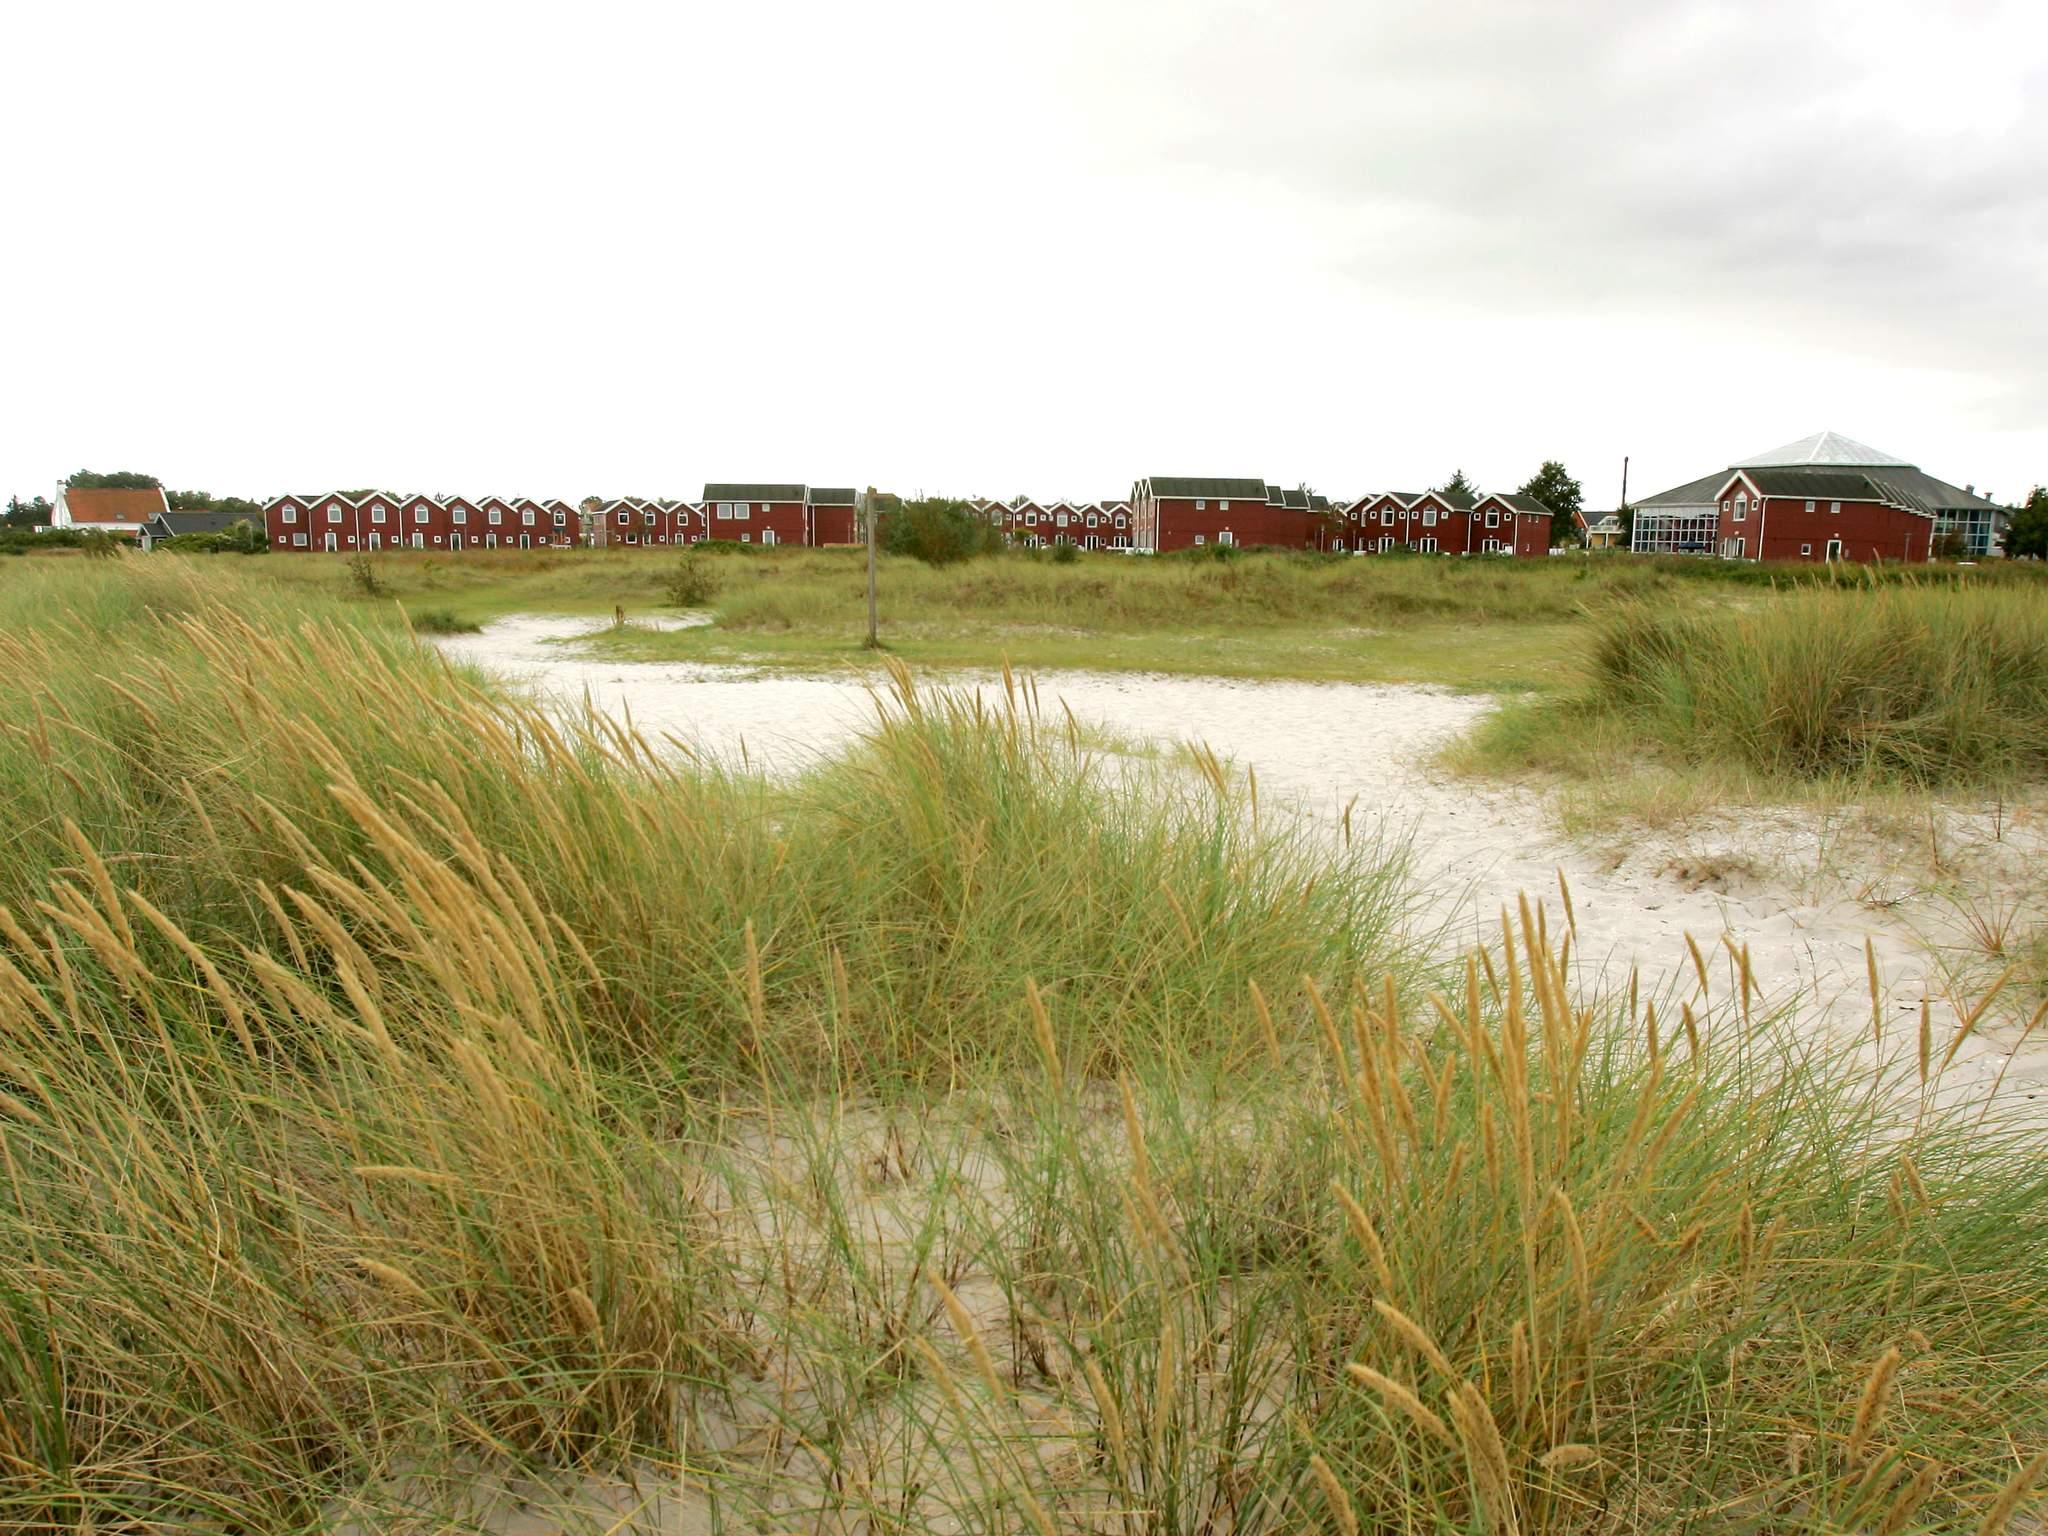 Ferienwohnung Øster Hurup (377970), Øster Hurup, , Ostjütland, Dänemark, Bild 12